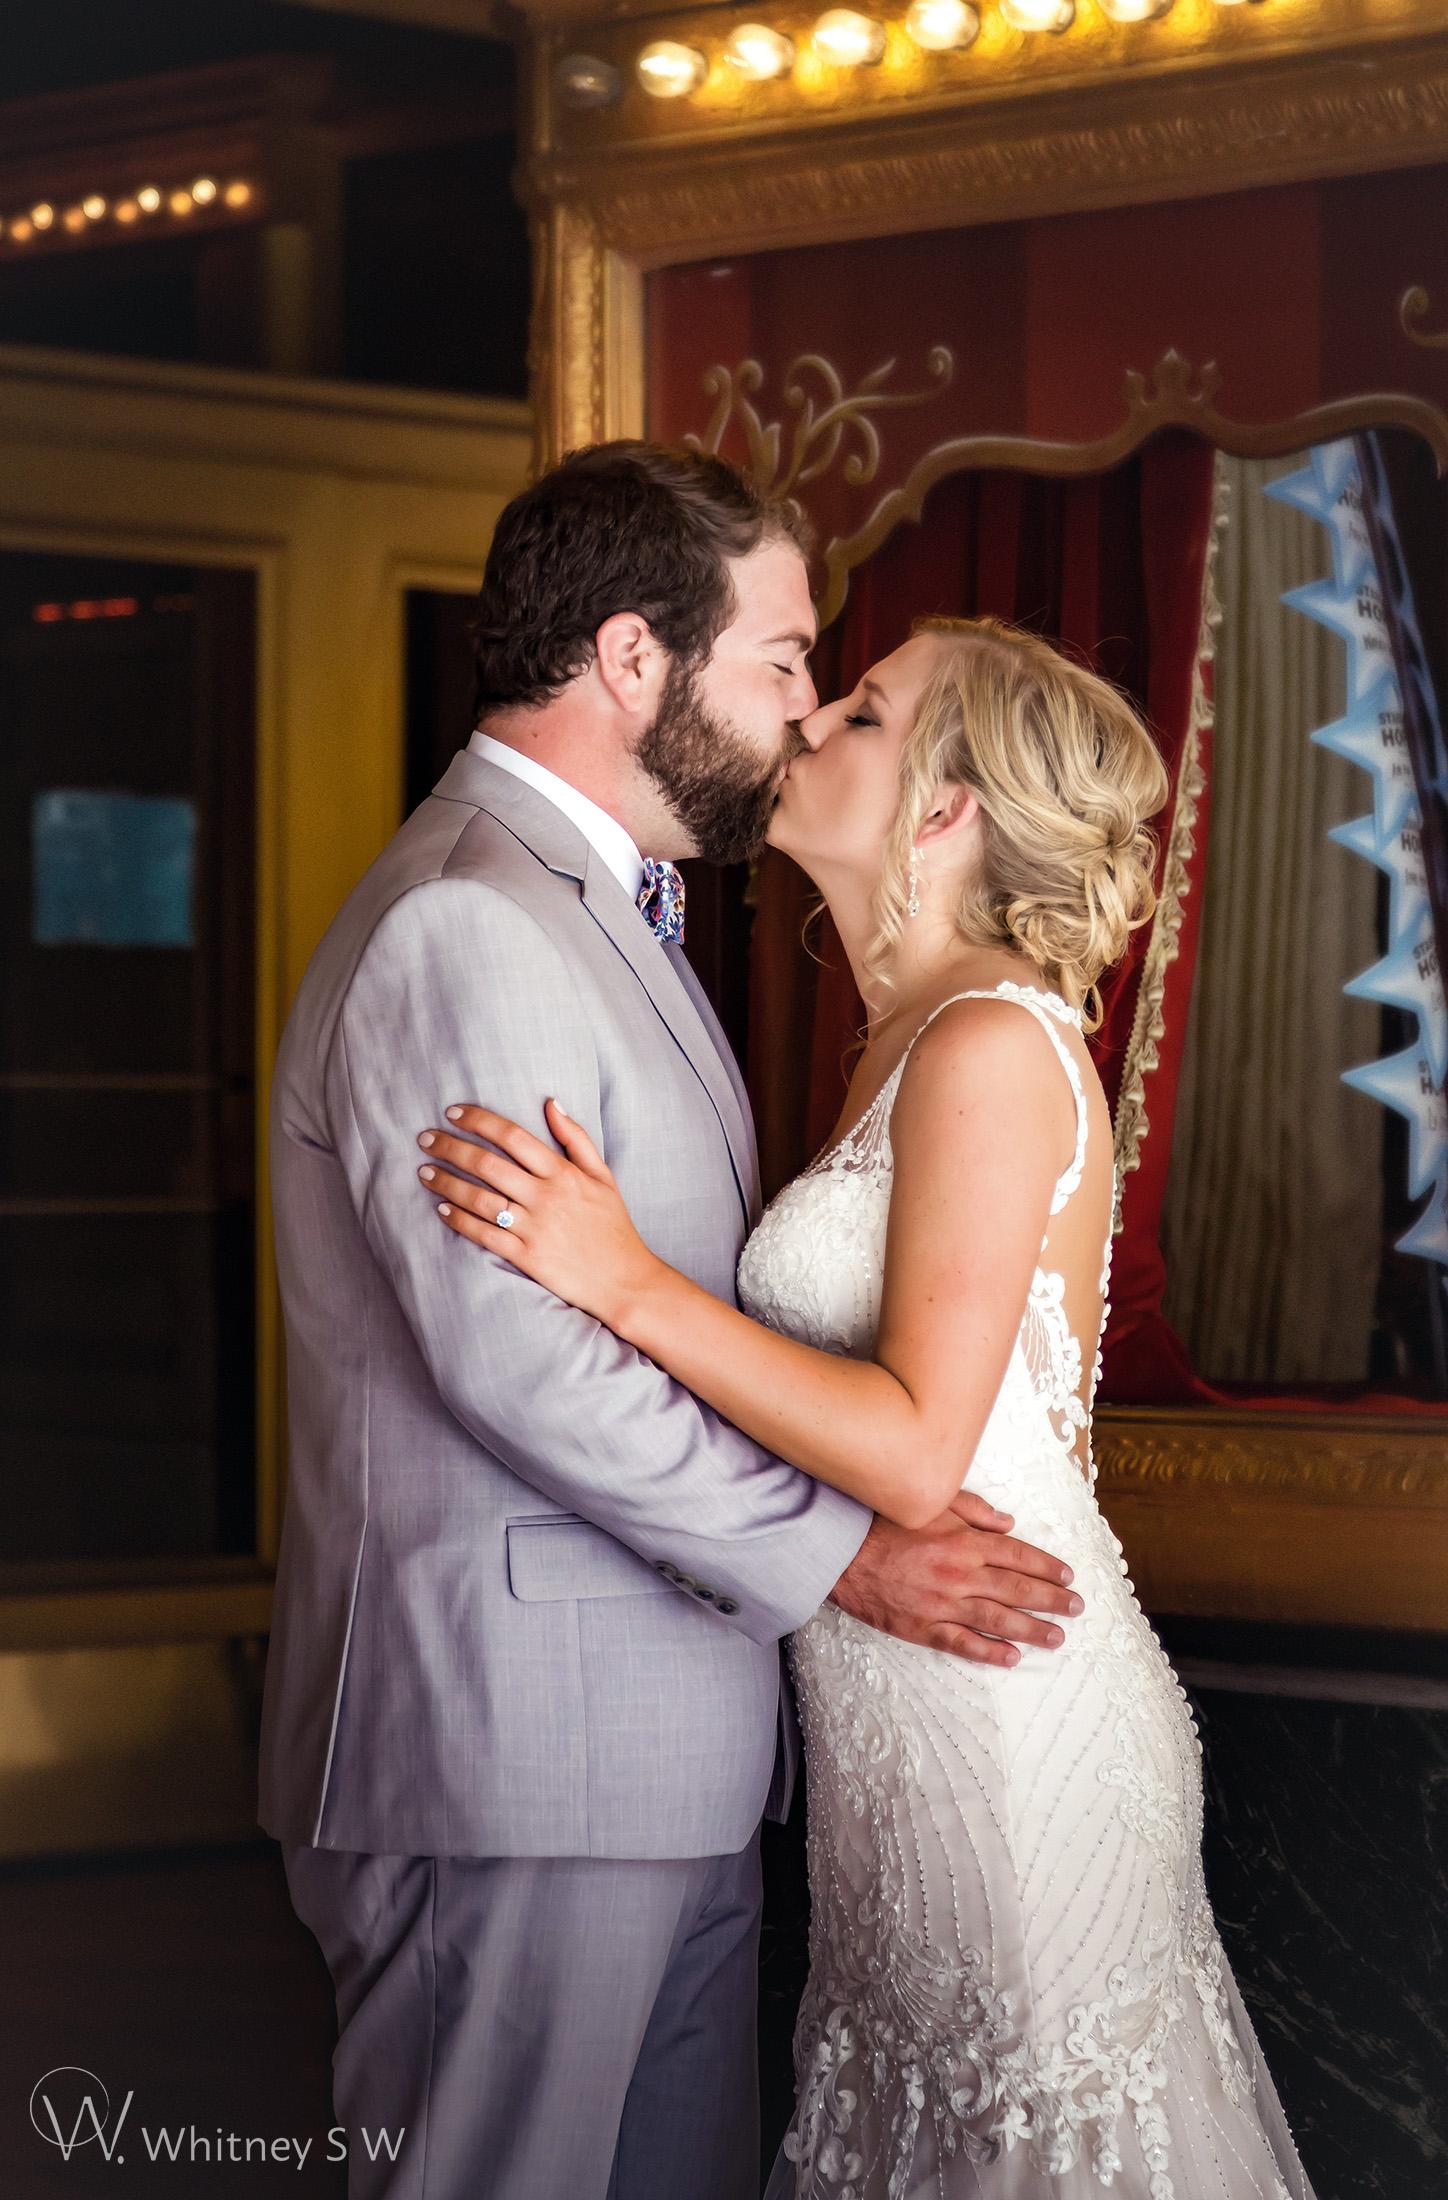 Morgan & Kaivon Wedding - Photography by Whitney S Williams whitneysw (34).jpg